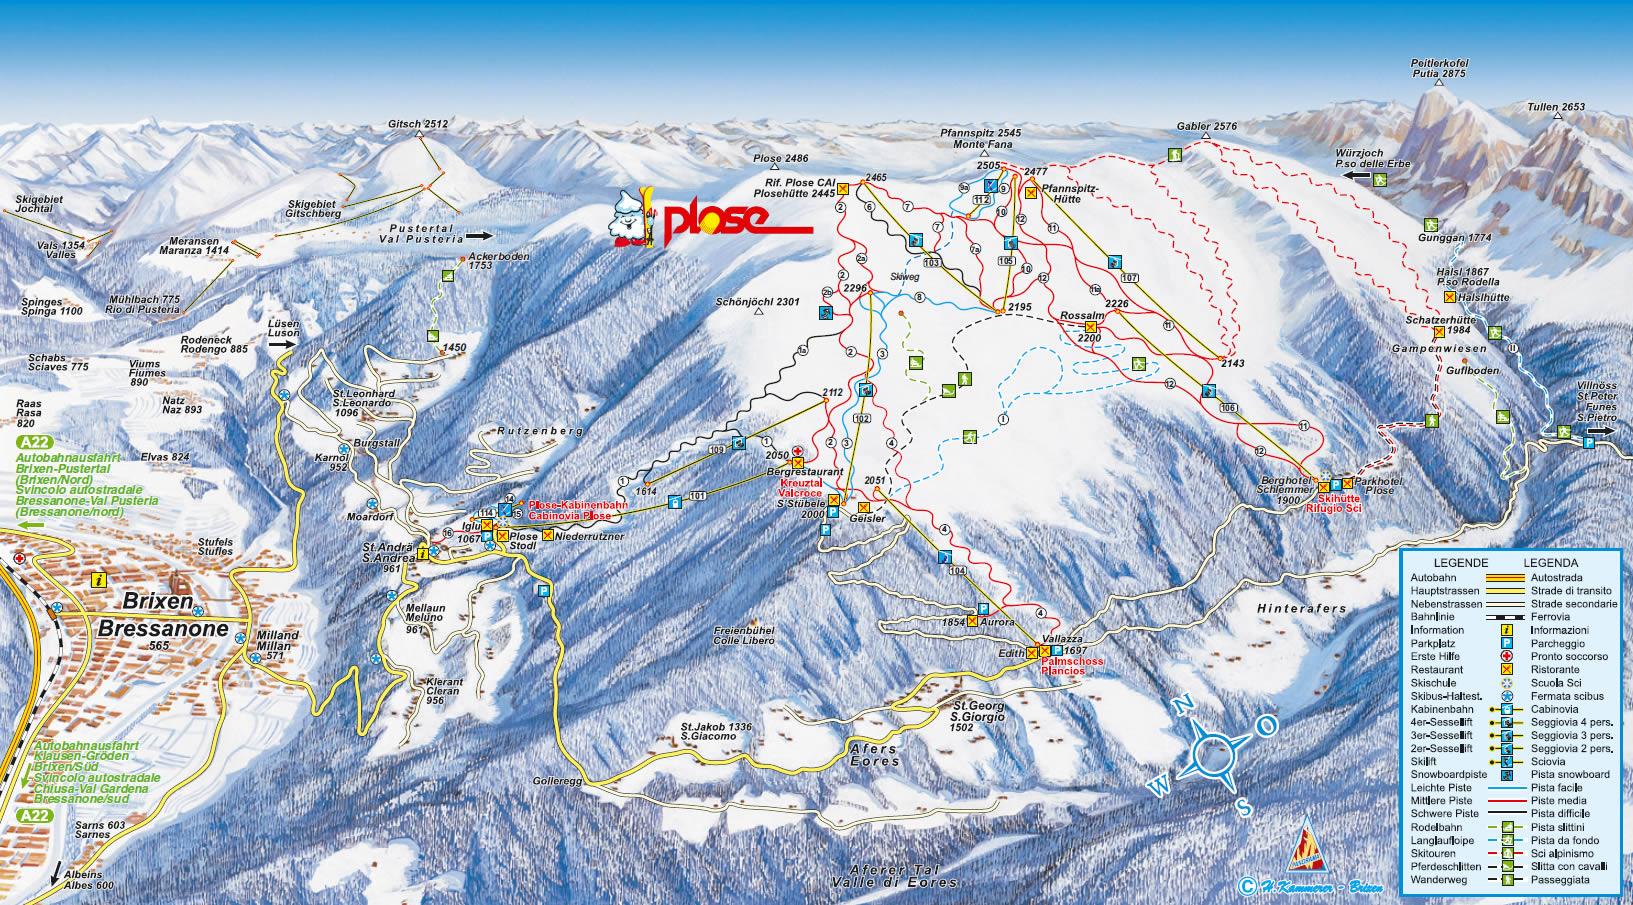 Plose Brixen Piste / Trail Map